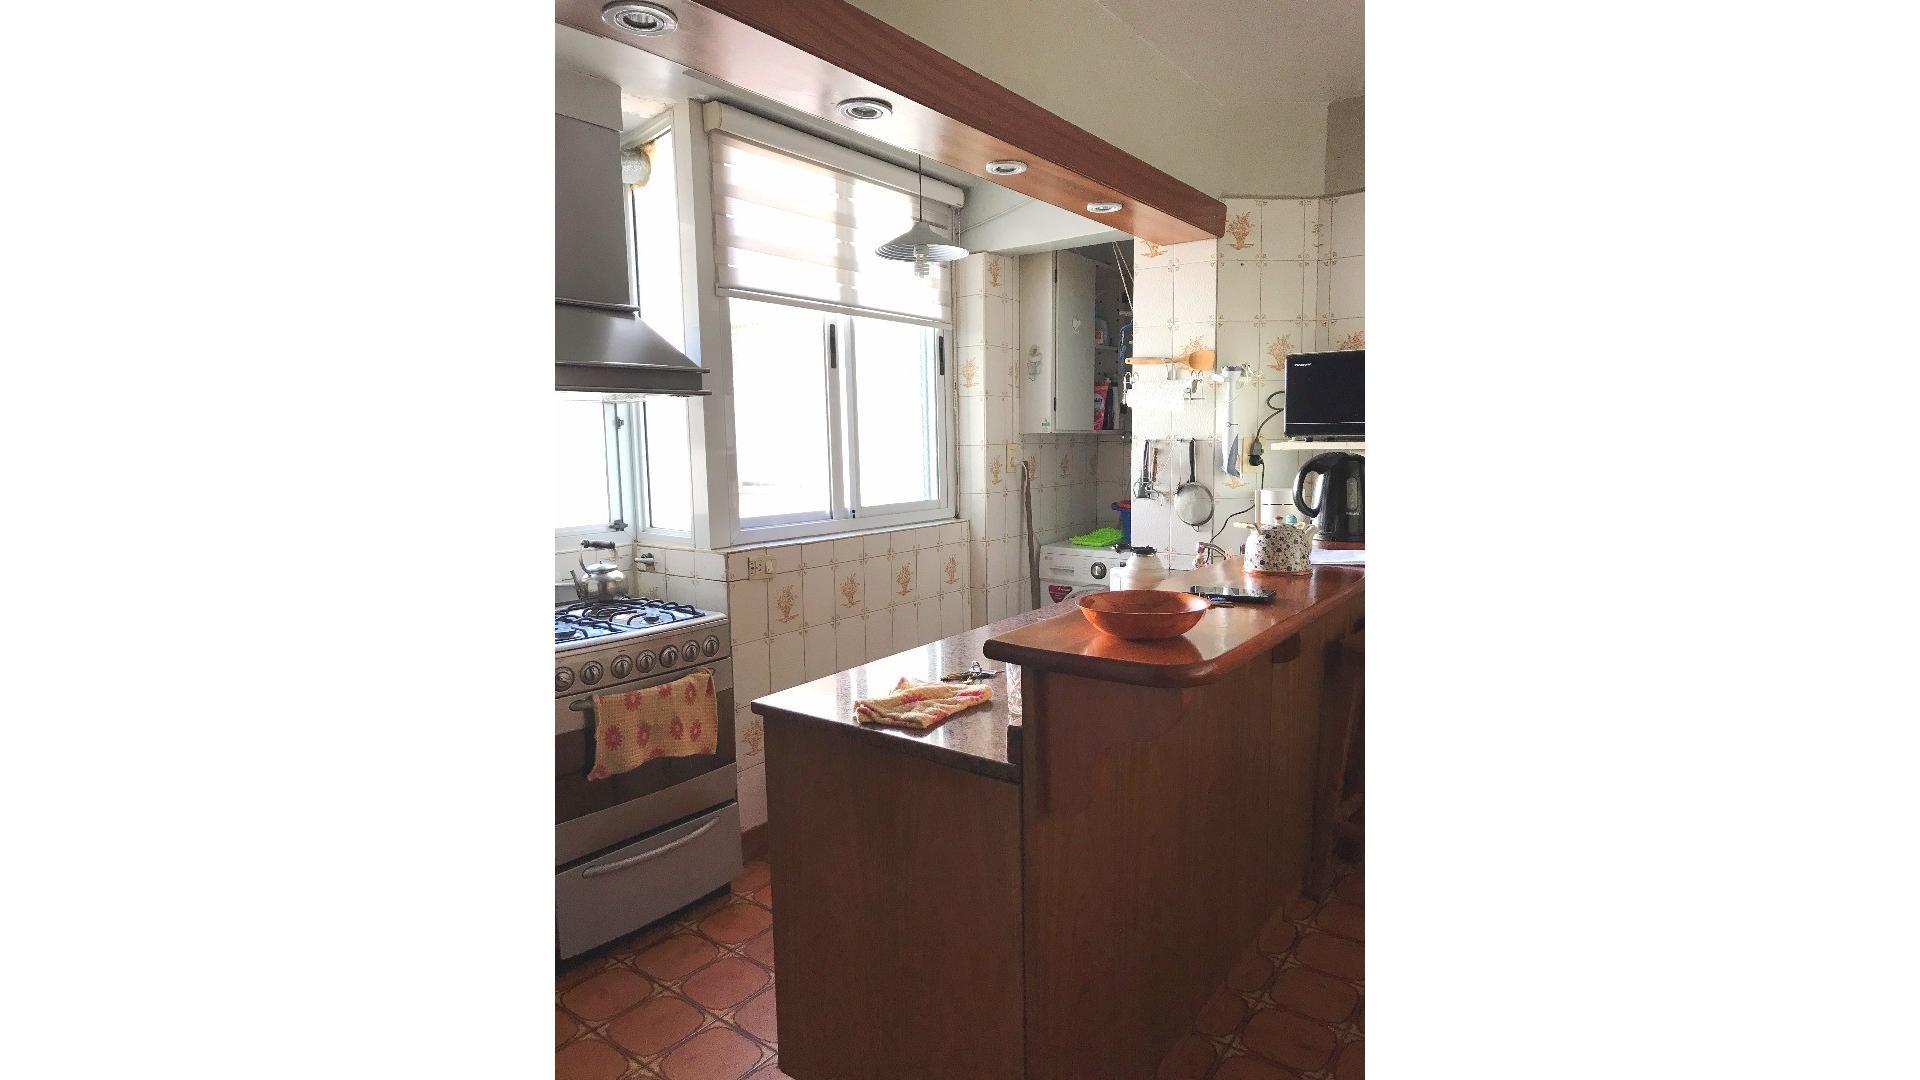 Liv-Com a Balcón - 3 Dormitorios - Cocina Com/Diario -Baño y Toilette - Baulera